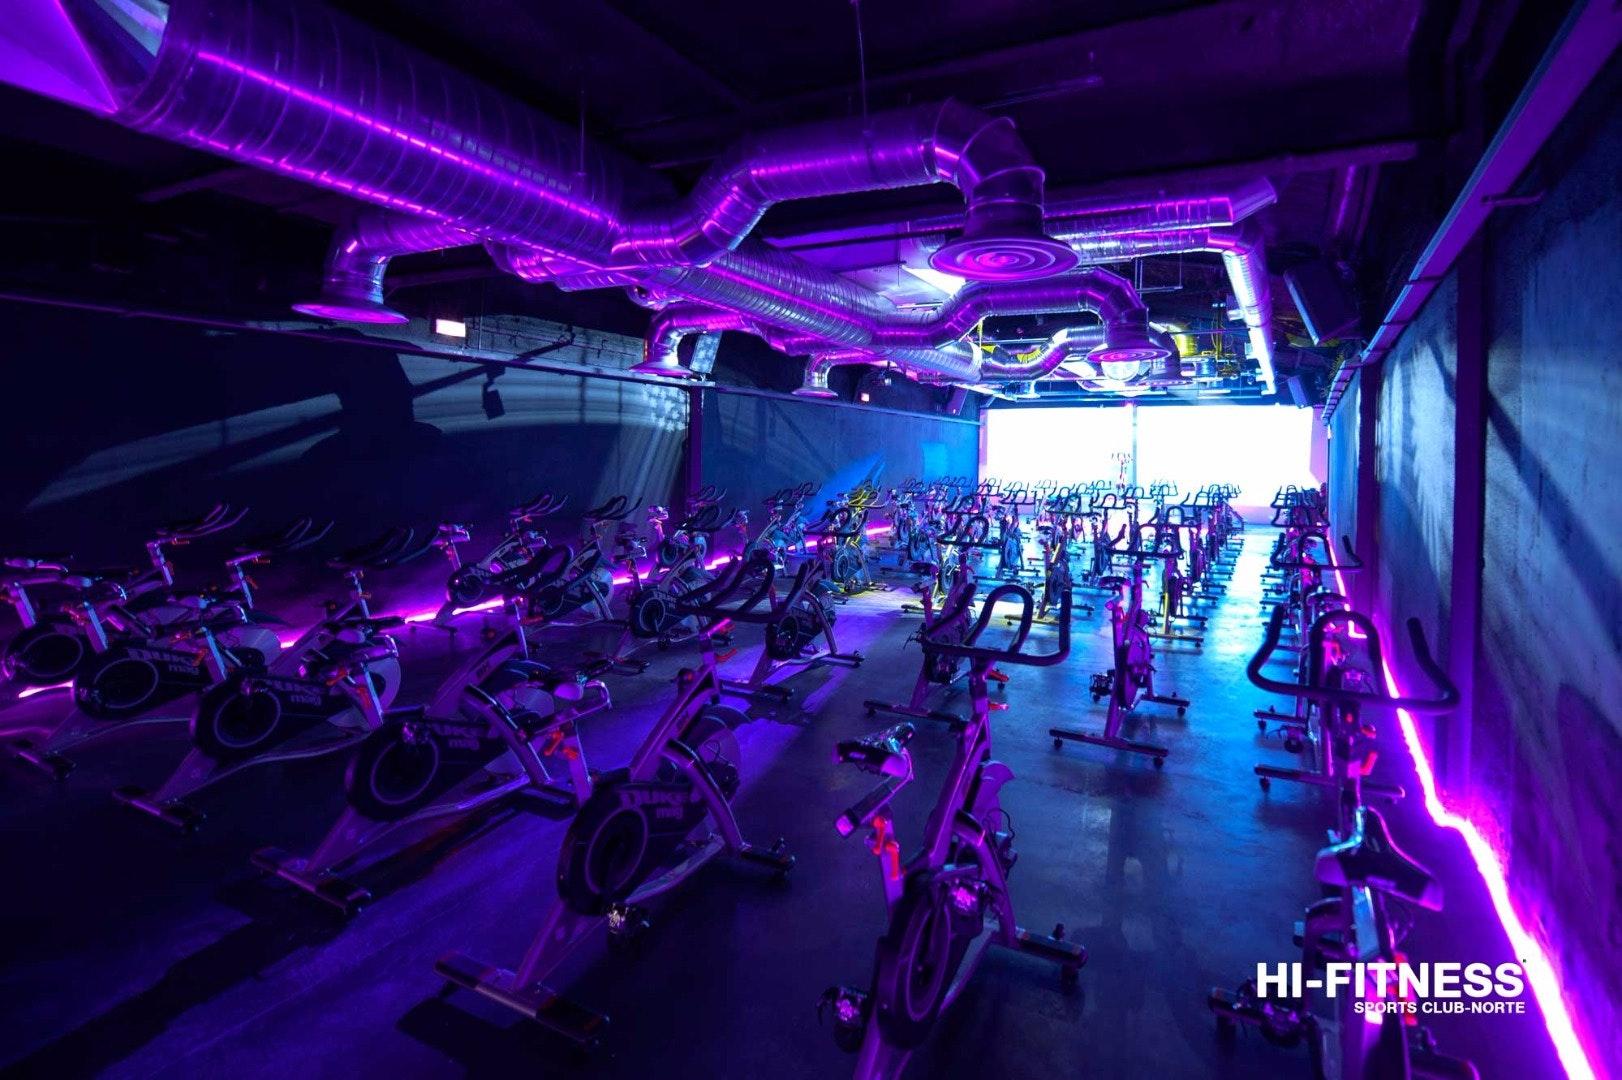 Foto 19 Oferta Gimnasio Hi fitness Norte Madrid - GymForLess